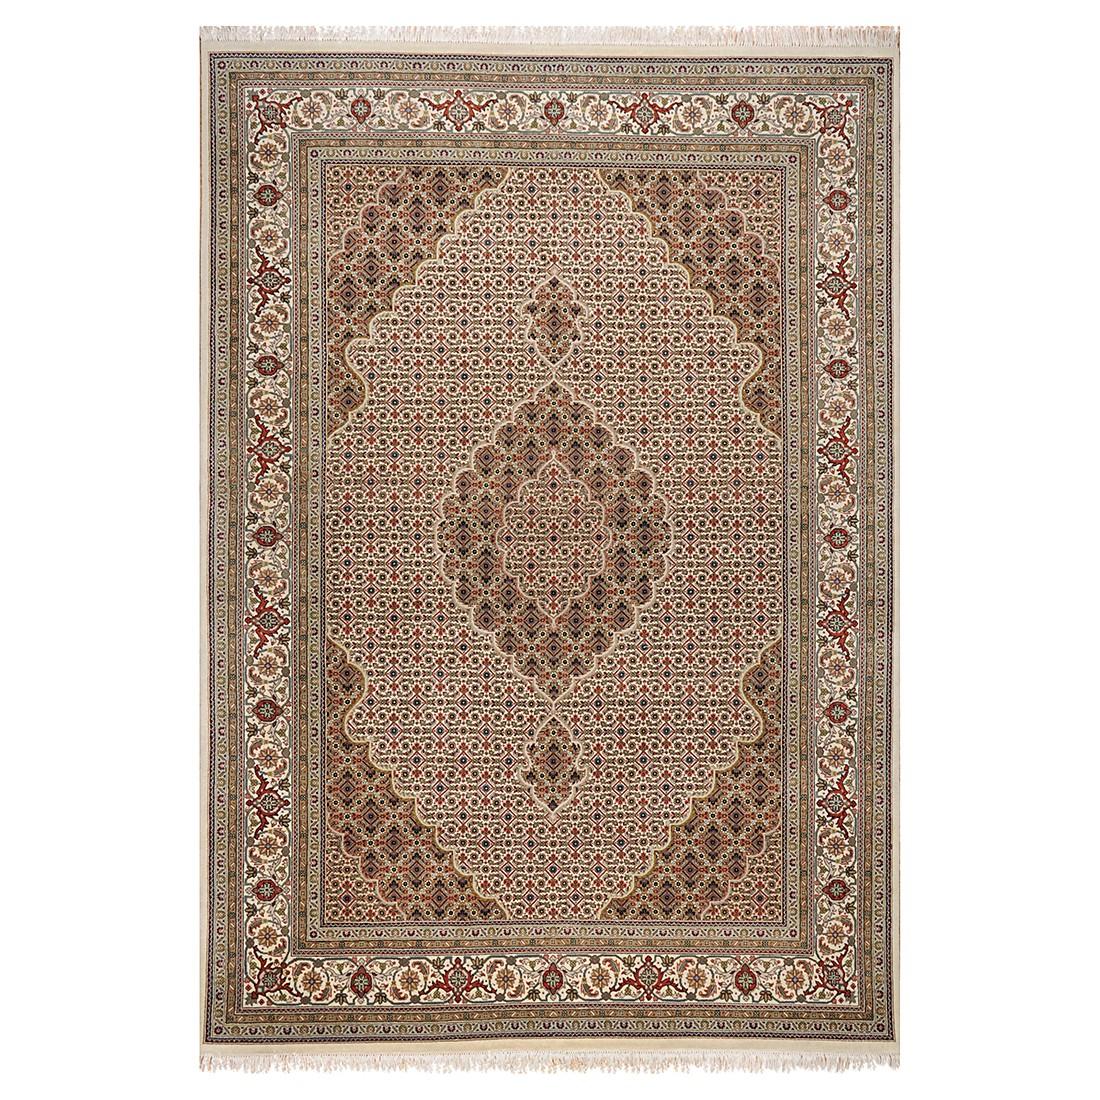 teppich sirsa mahi silk touch seide creme 250 cm x 350 cm theko die markenteppiche g nstig. Black Bedroom Furniture Sets. Home Design Ideas